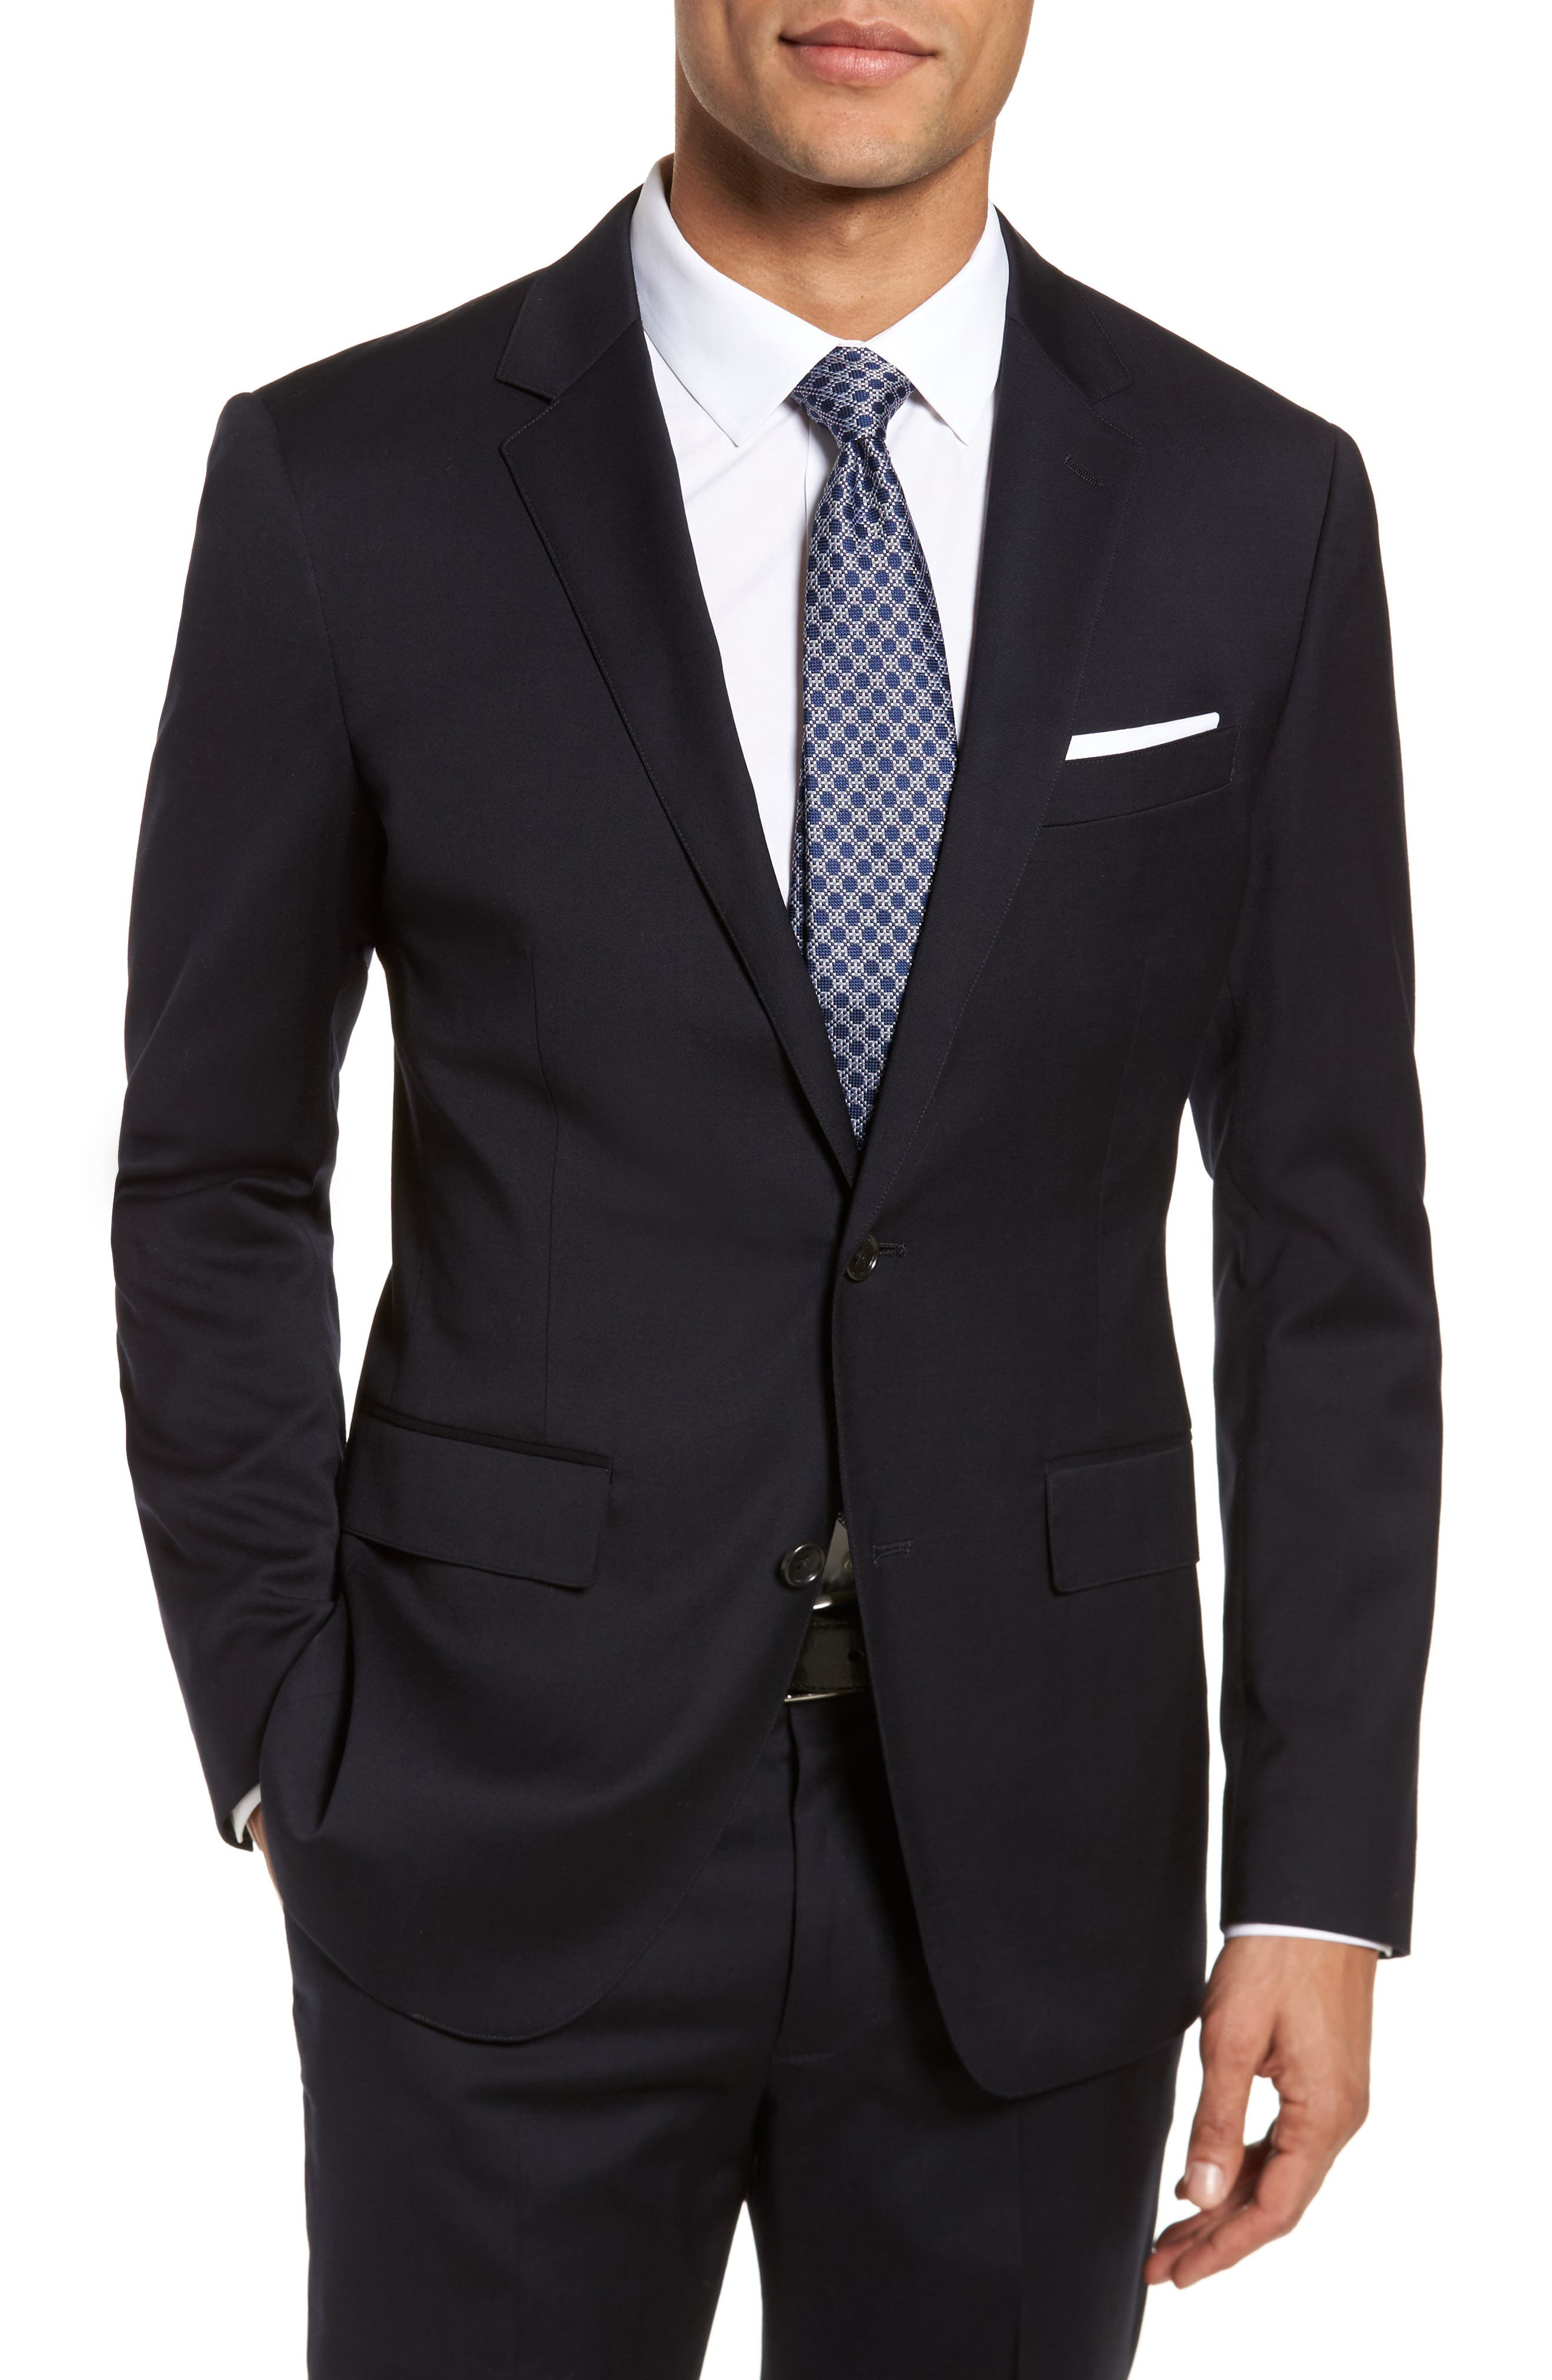 BONOBOS Jetsetter Trim Fit Stretch Wool Suit Jacket in Black